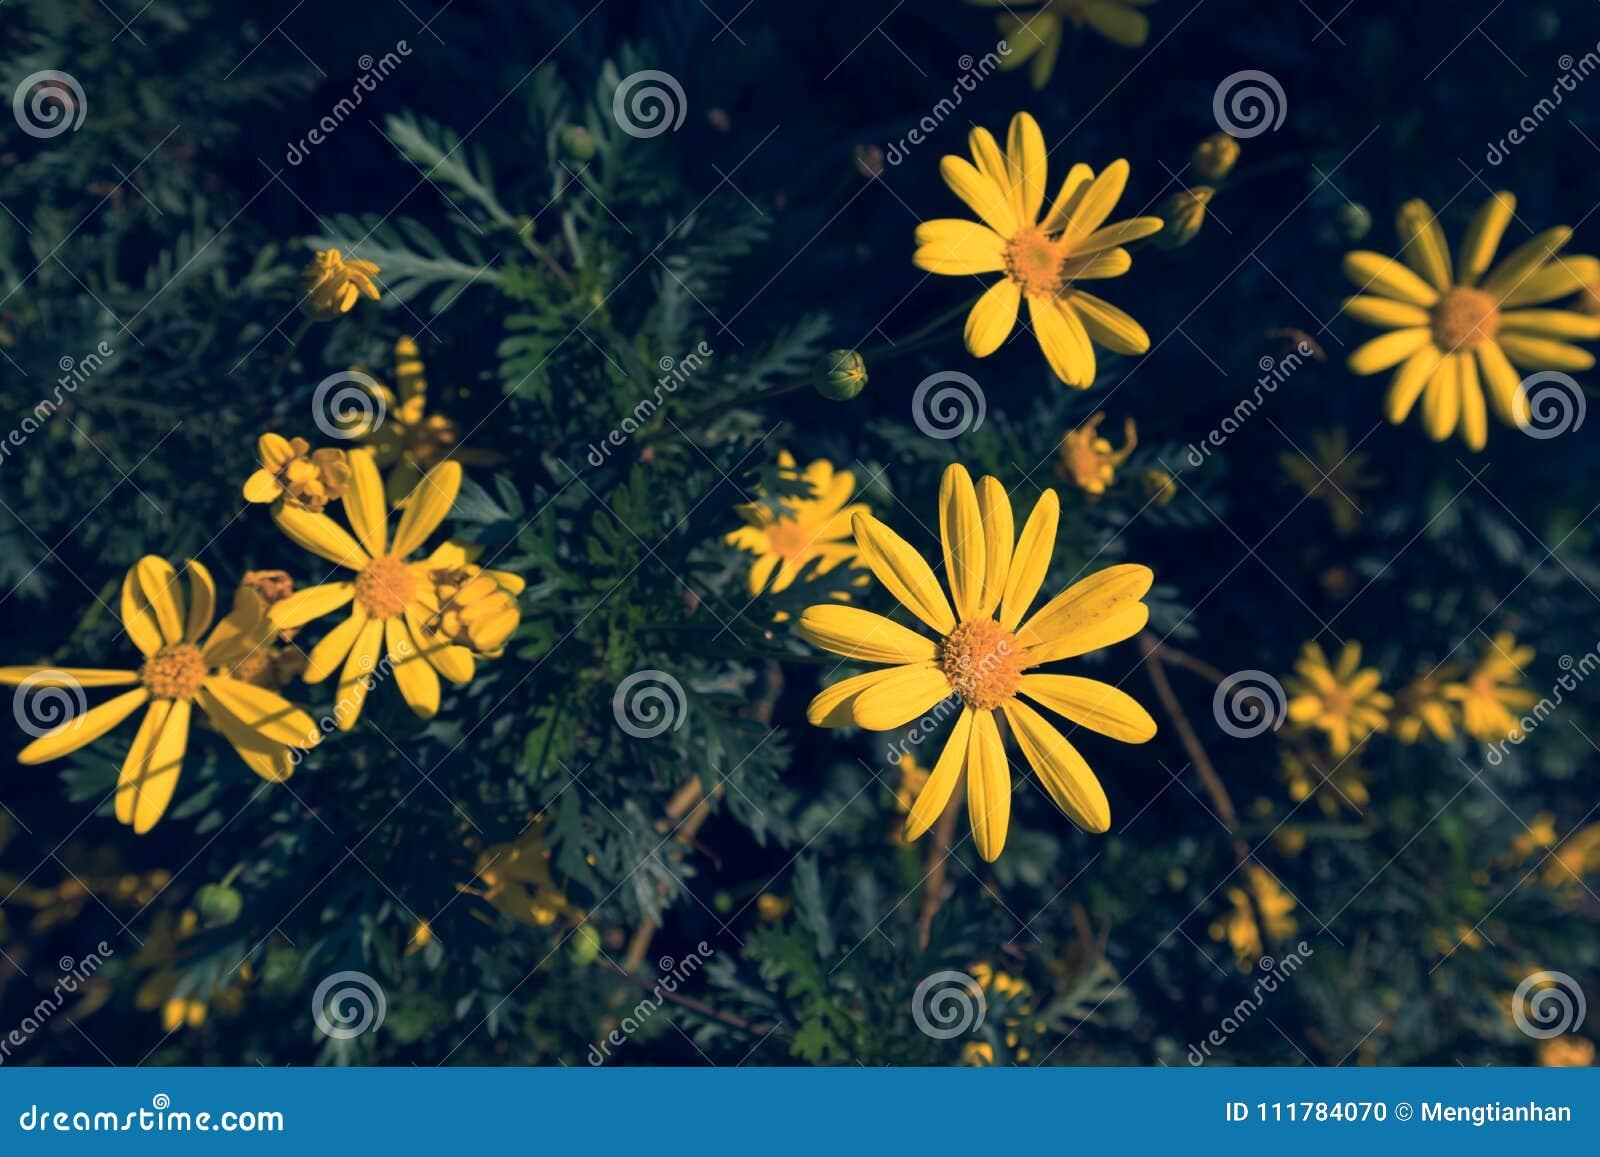 On the roadside wild calliopsis stock photo image of blue flower royalty free stock photo izmirmasajfo Gallery